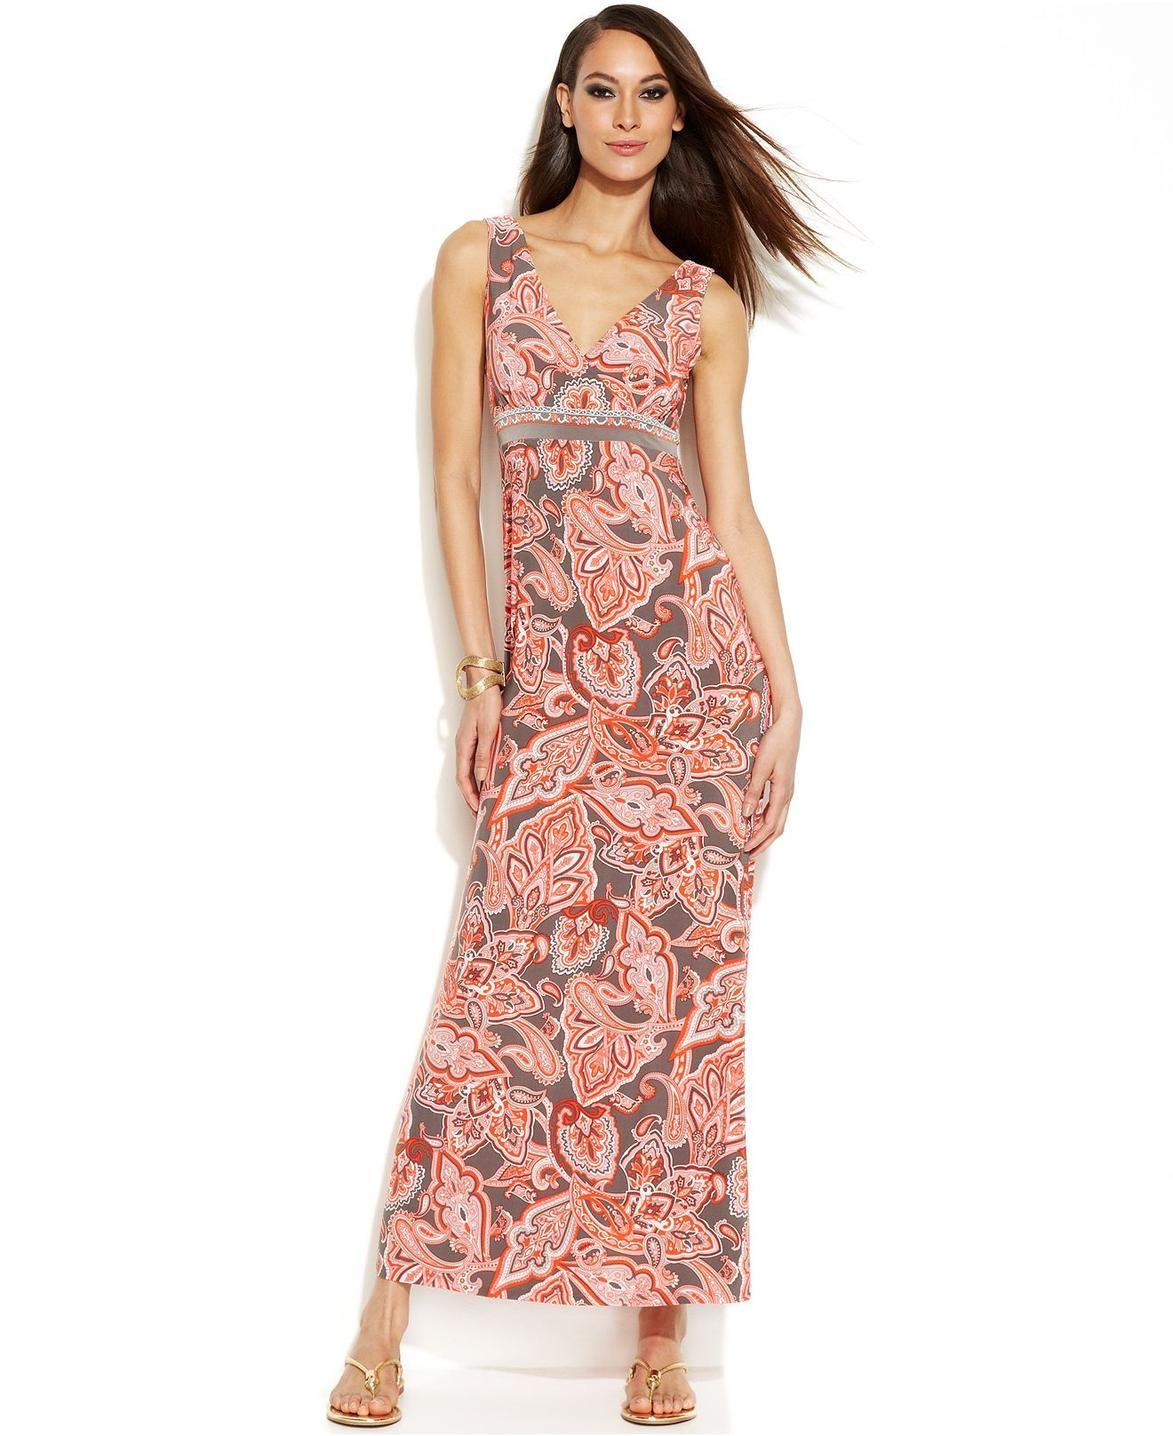 a960d7cde8b Petite Sleeveless Maxi Dresses